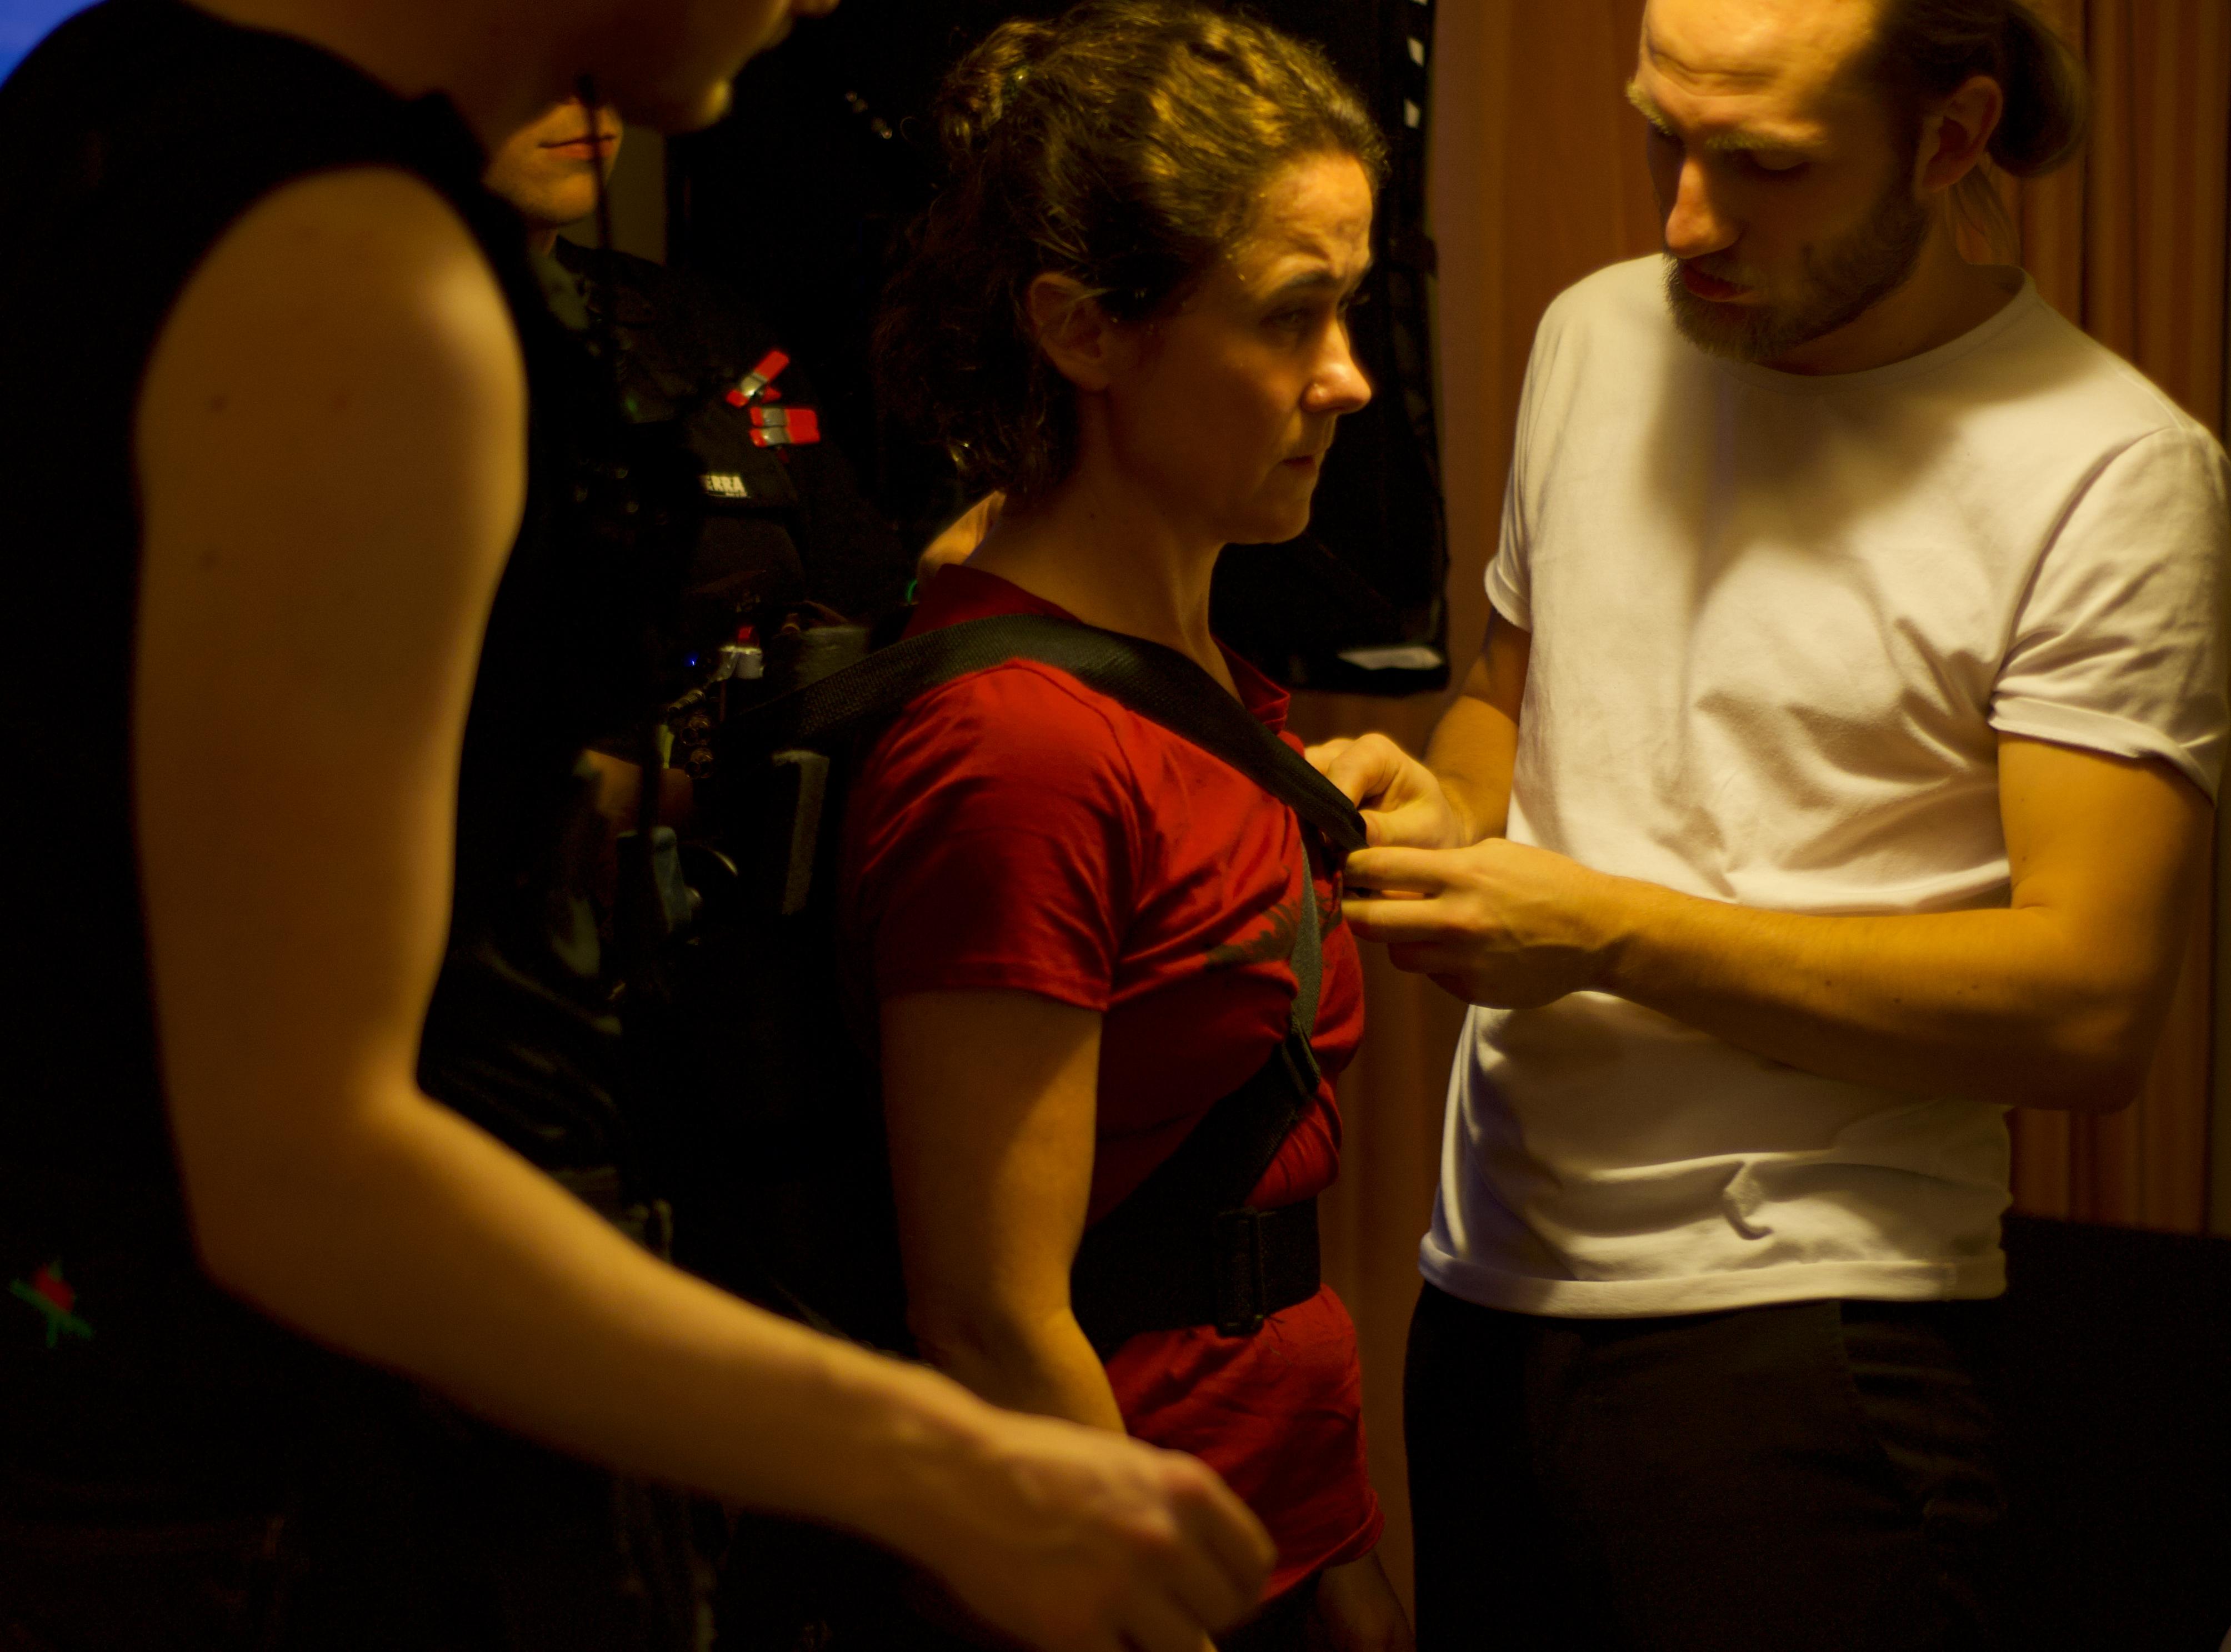 Knocking Cinematograph Hannes Krantz